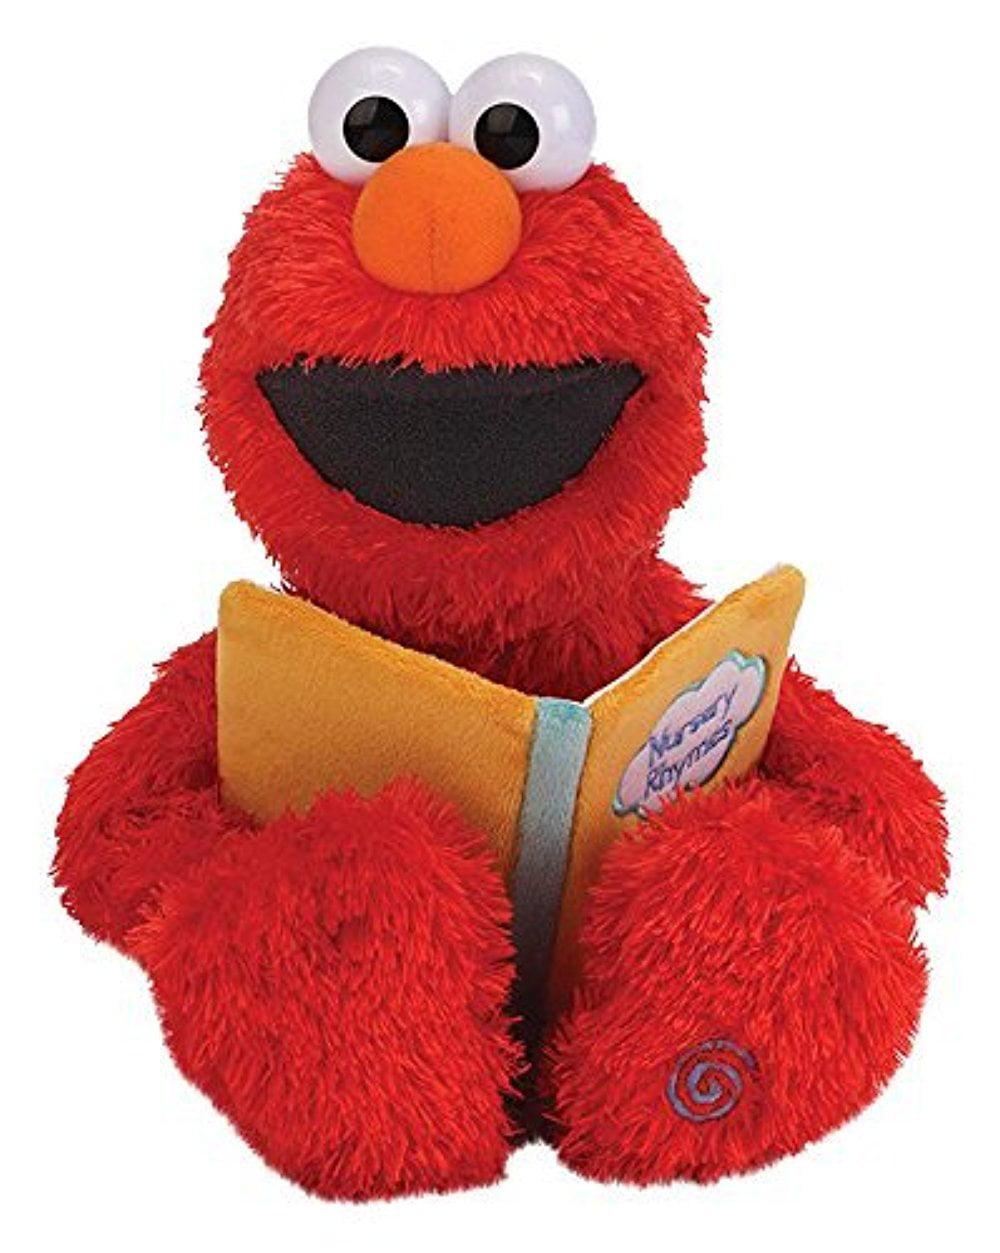 "Sesame Street Nursery Rhyme Elmo 15"" Plush by Gund"